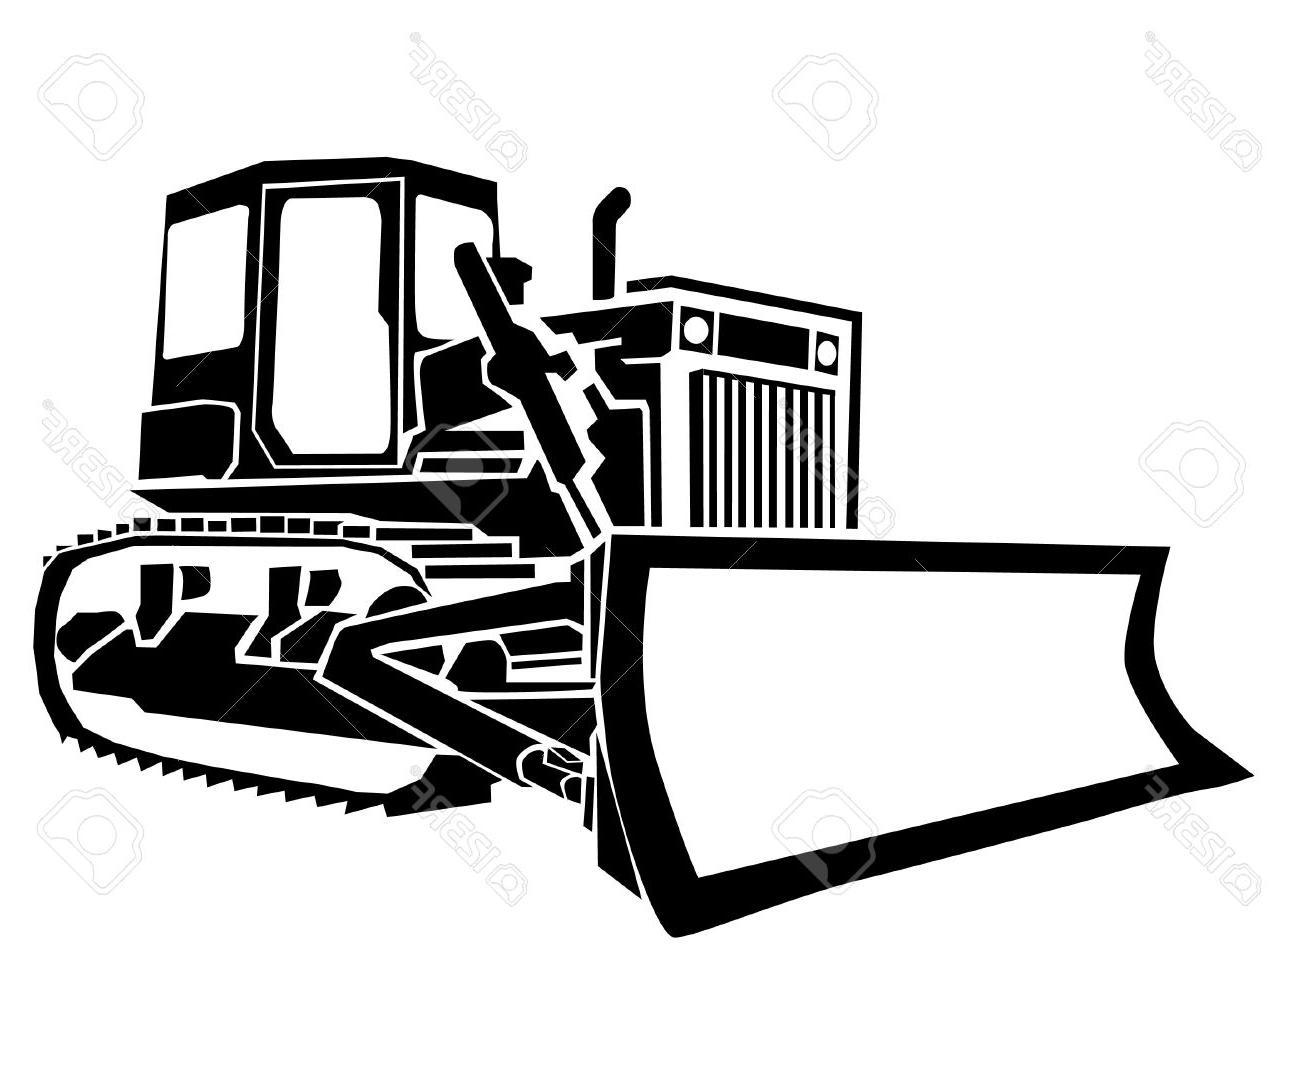 transparent stock Dozer free download best. Bulldozer clipart vector.